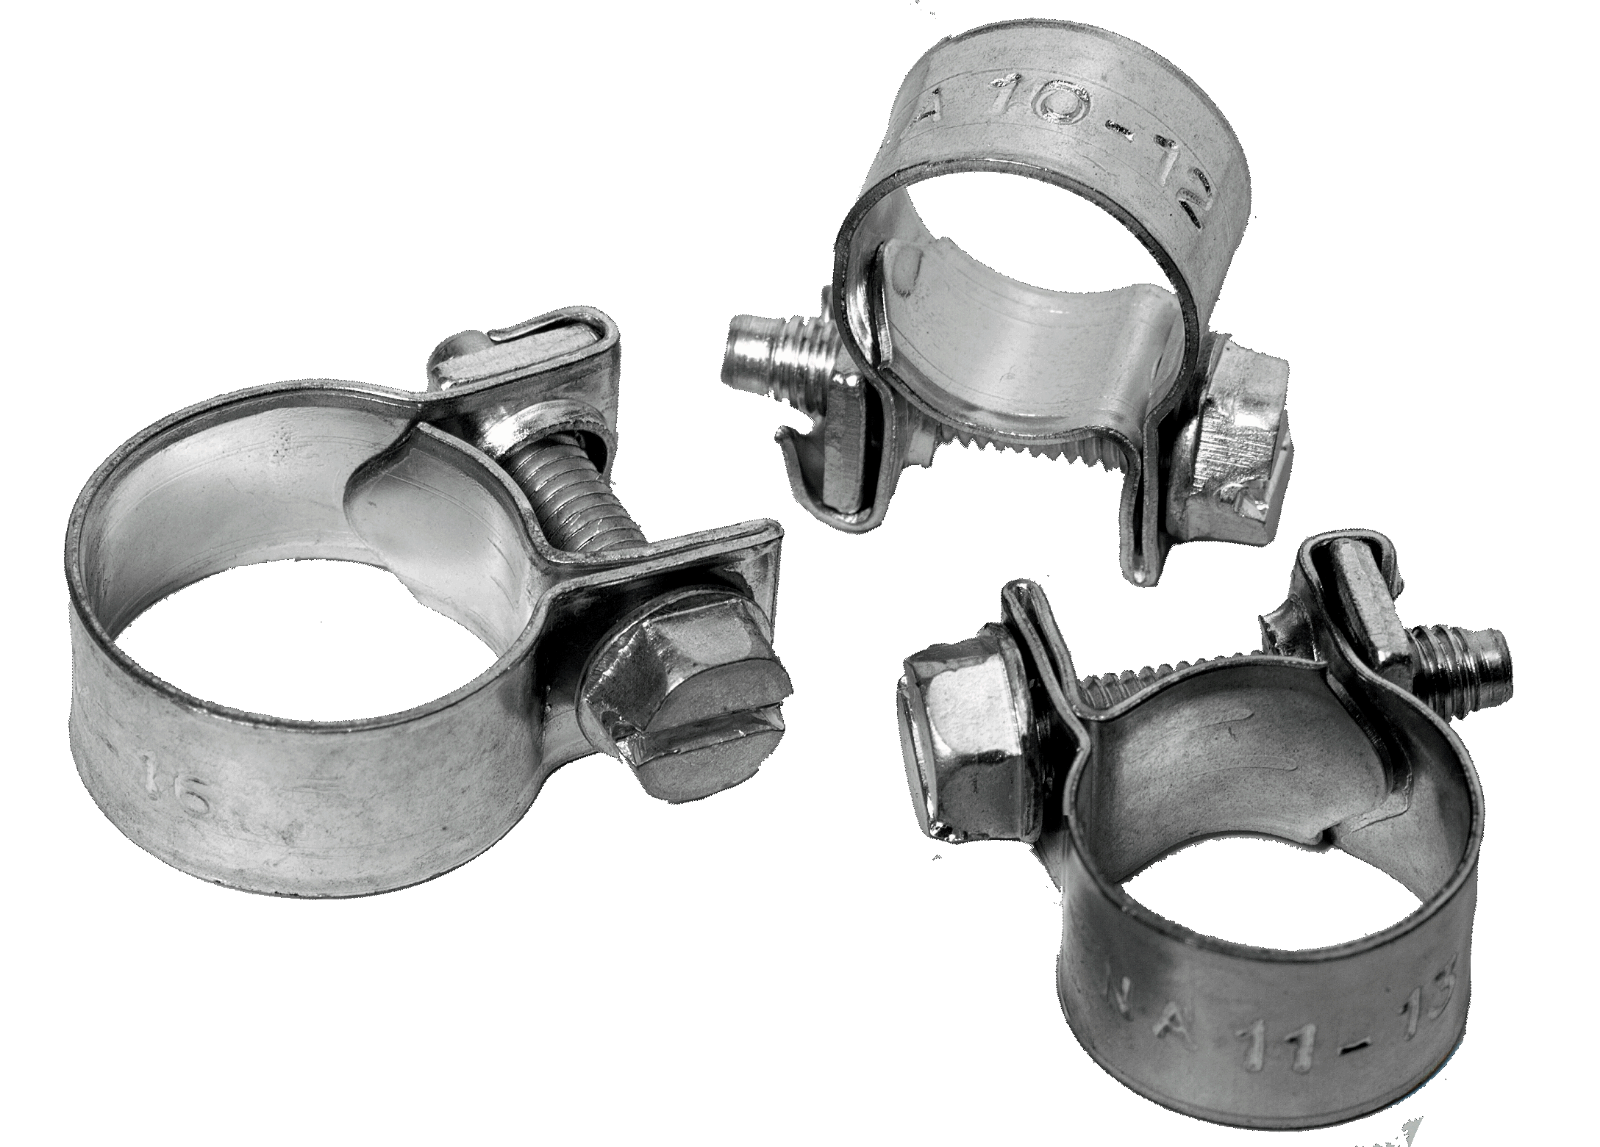 Stainless Steel Jubilee Hose Clip Mini Fuel Line Clamp Diesel Petrol Pipe Clamps 11